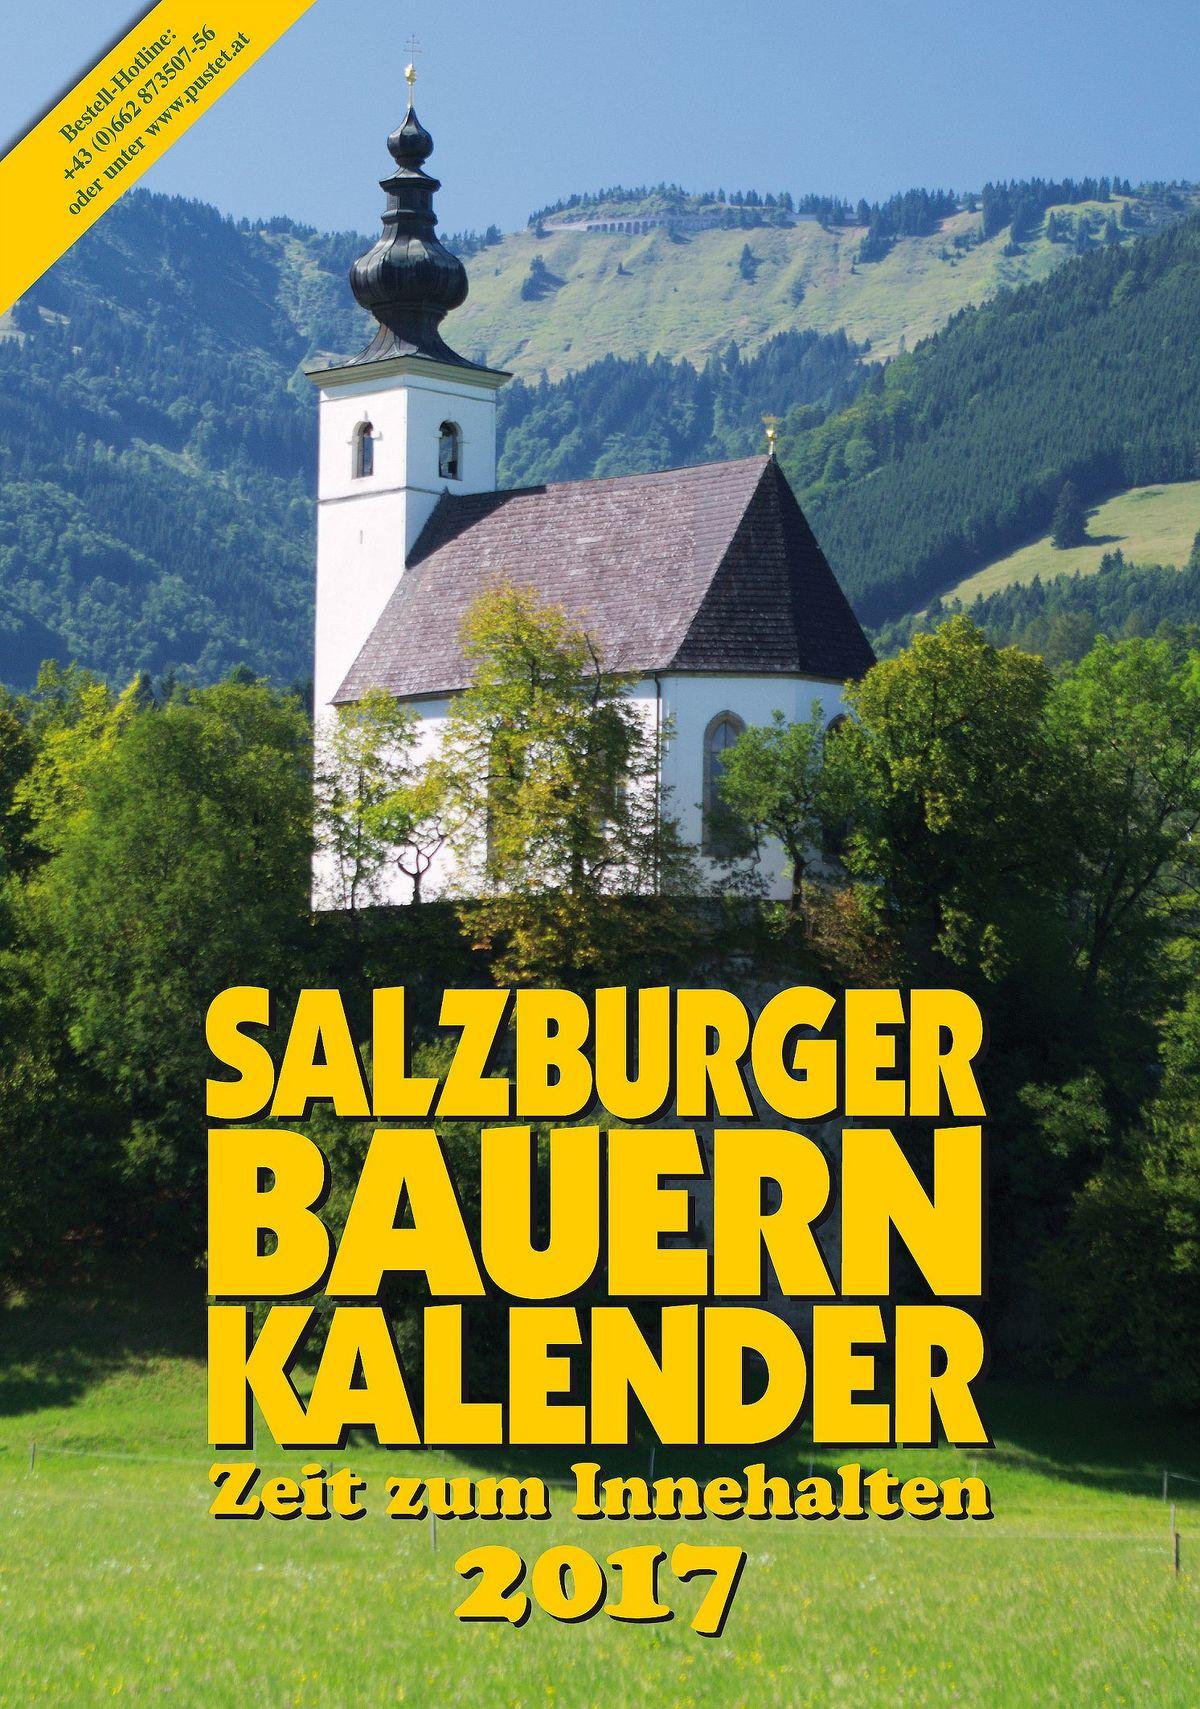 Salzburger fenster bekanntschaften